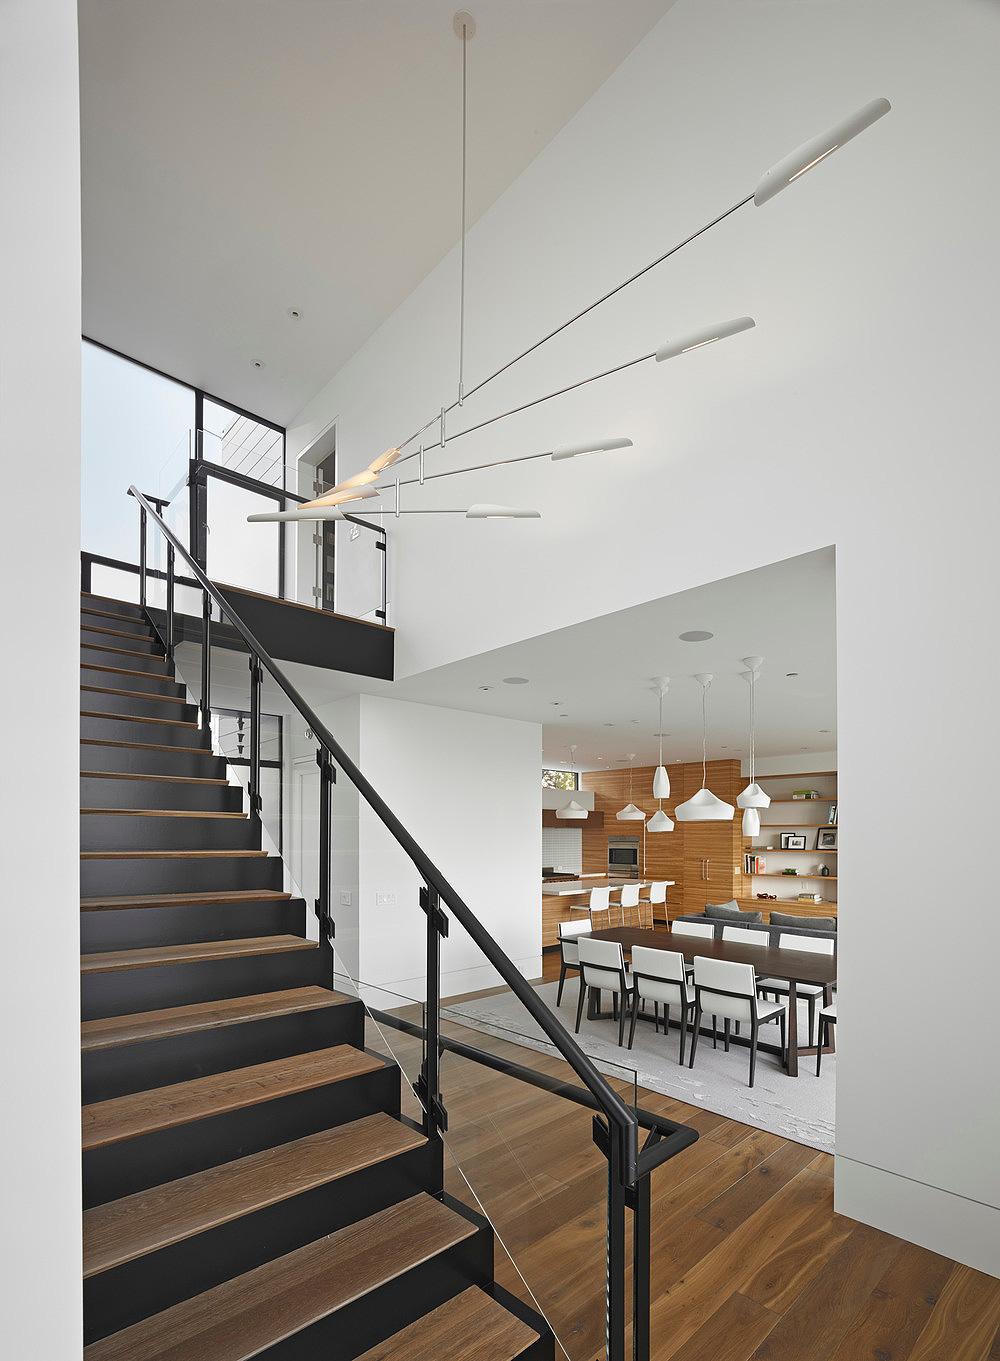 residencia-noa-studio-vara (9)